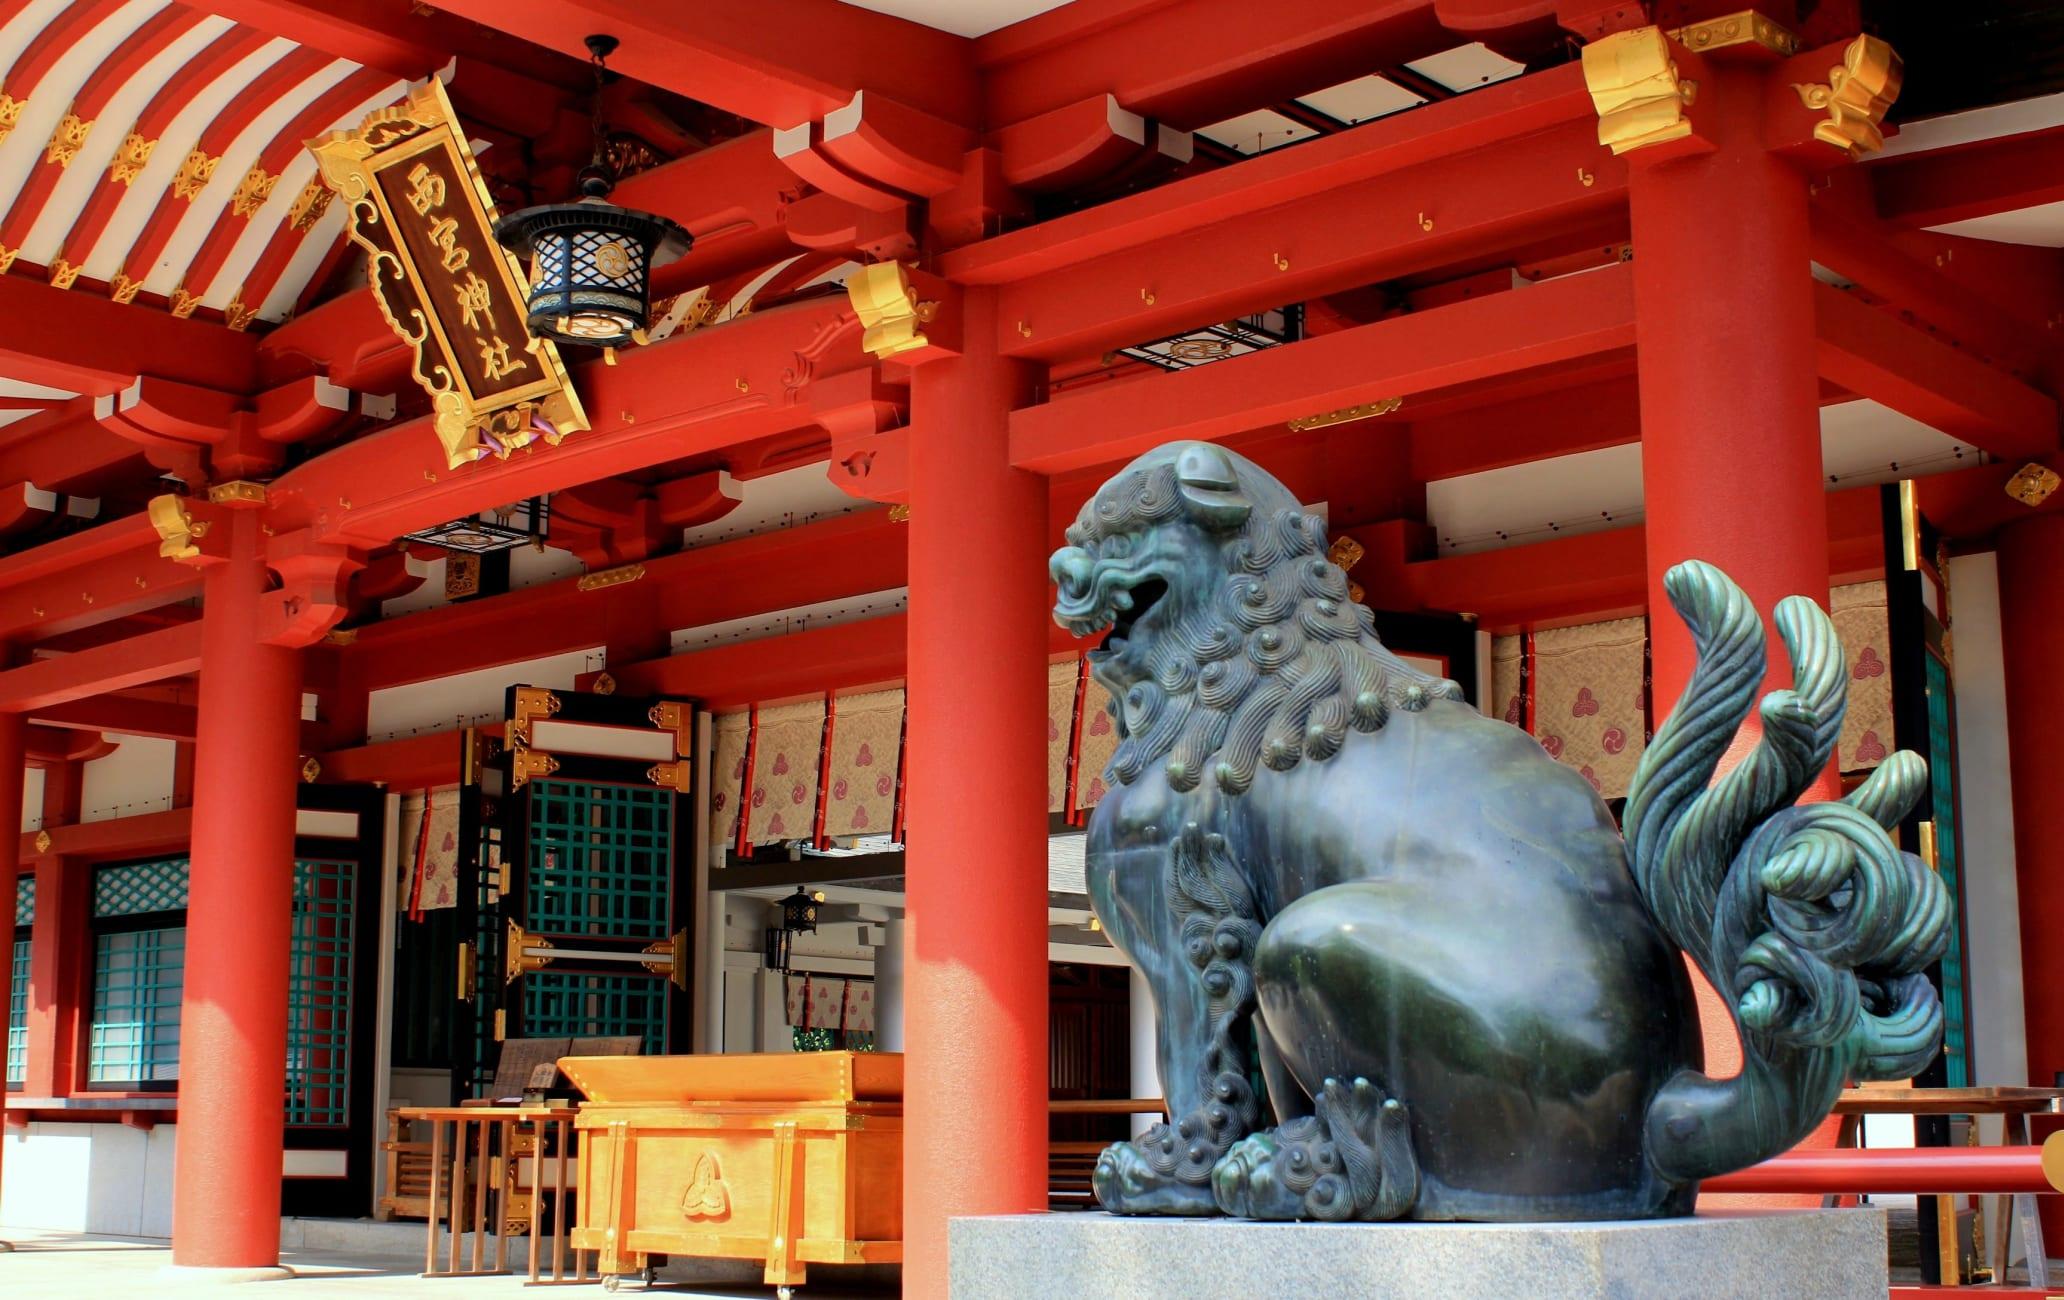 Nishinomiya-jinja Shrine -Nishinomiya Ebisu-san